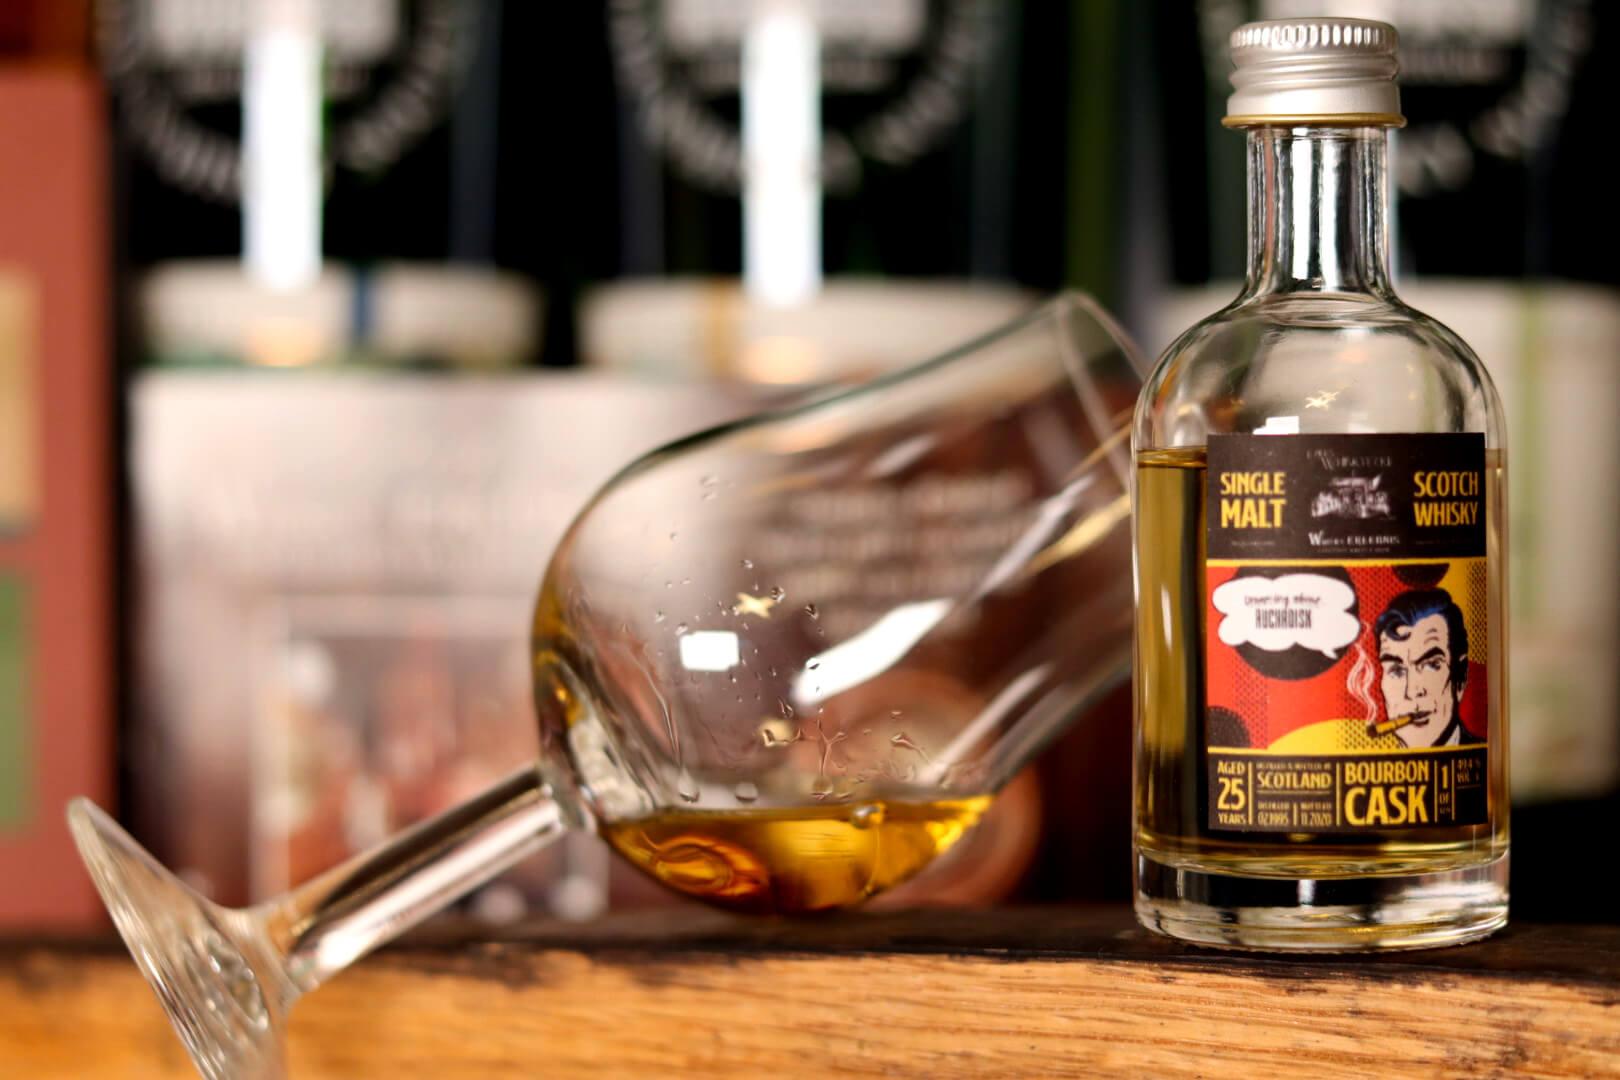 Whisky Review #191: Auchroisk 1995 / 2020 (Whisky Erlebnis)